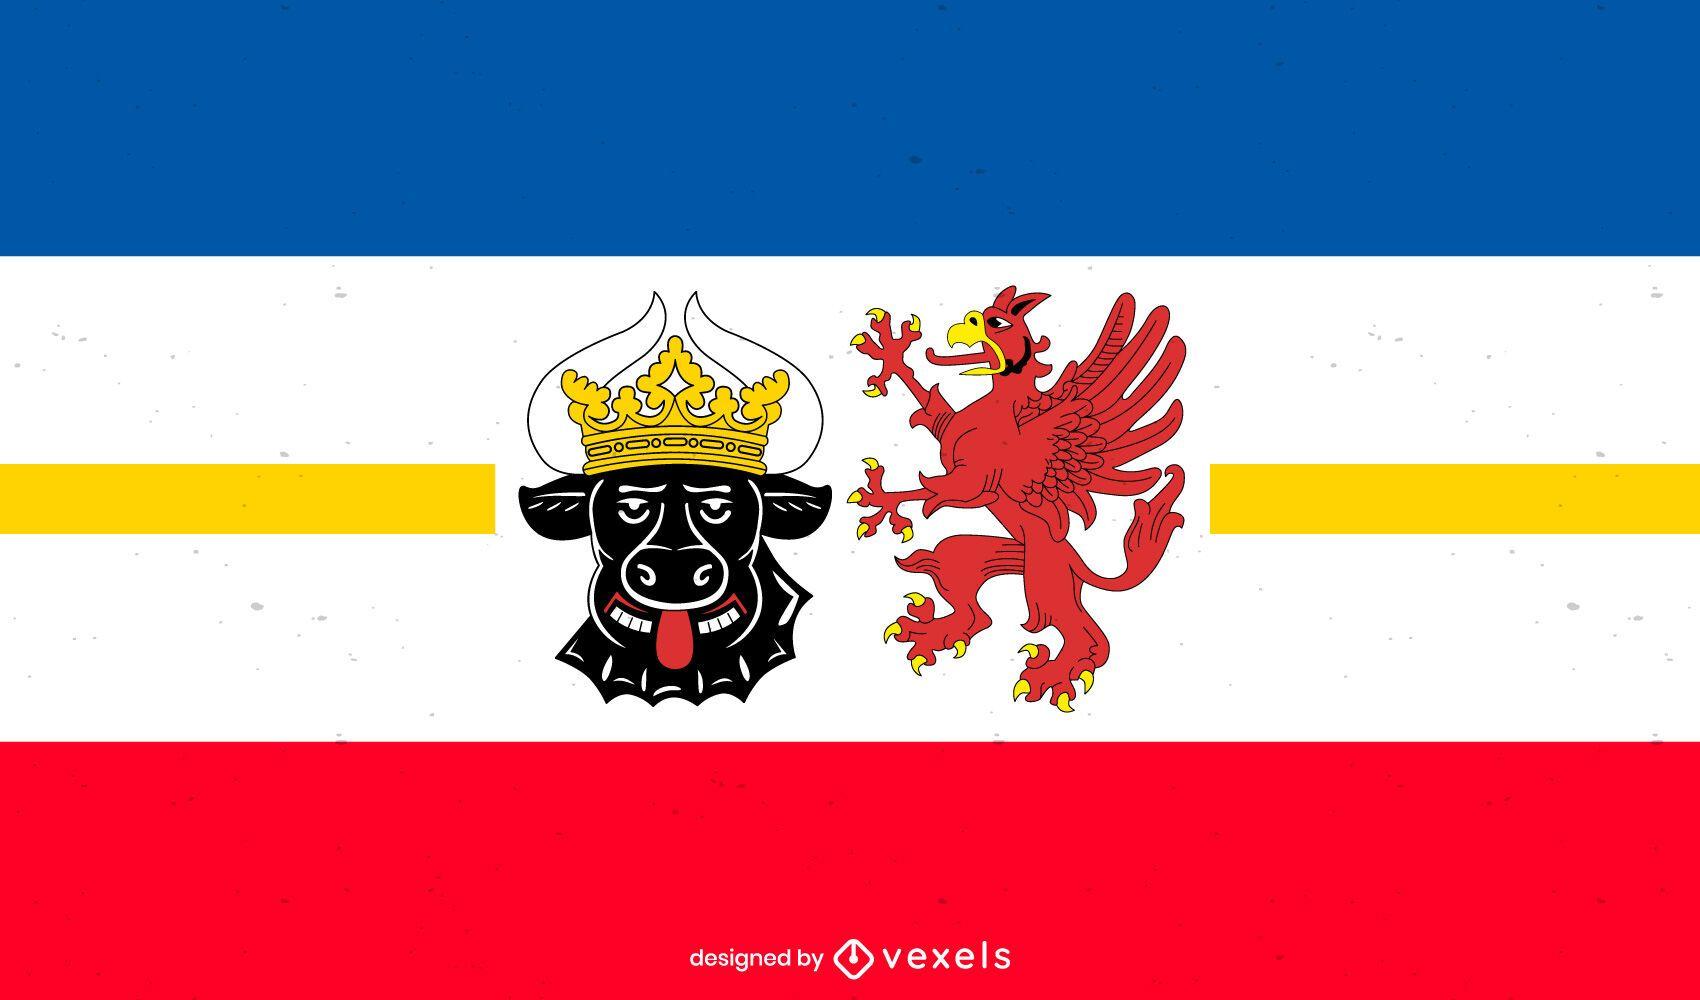 Desenho da bandeira do estado de Mecklenburg-Vorpommern